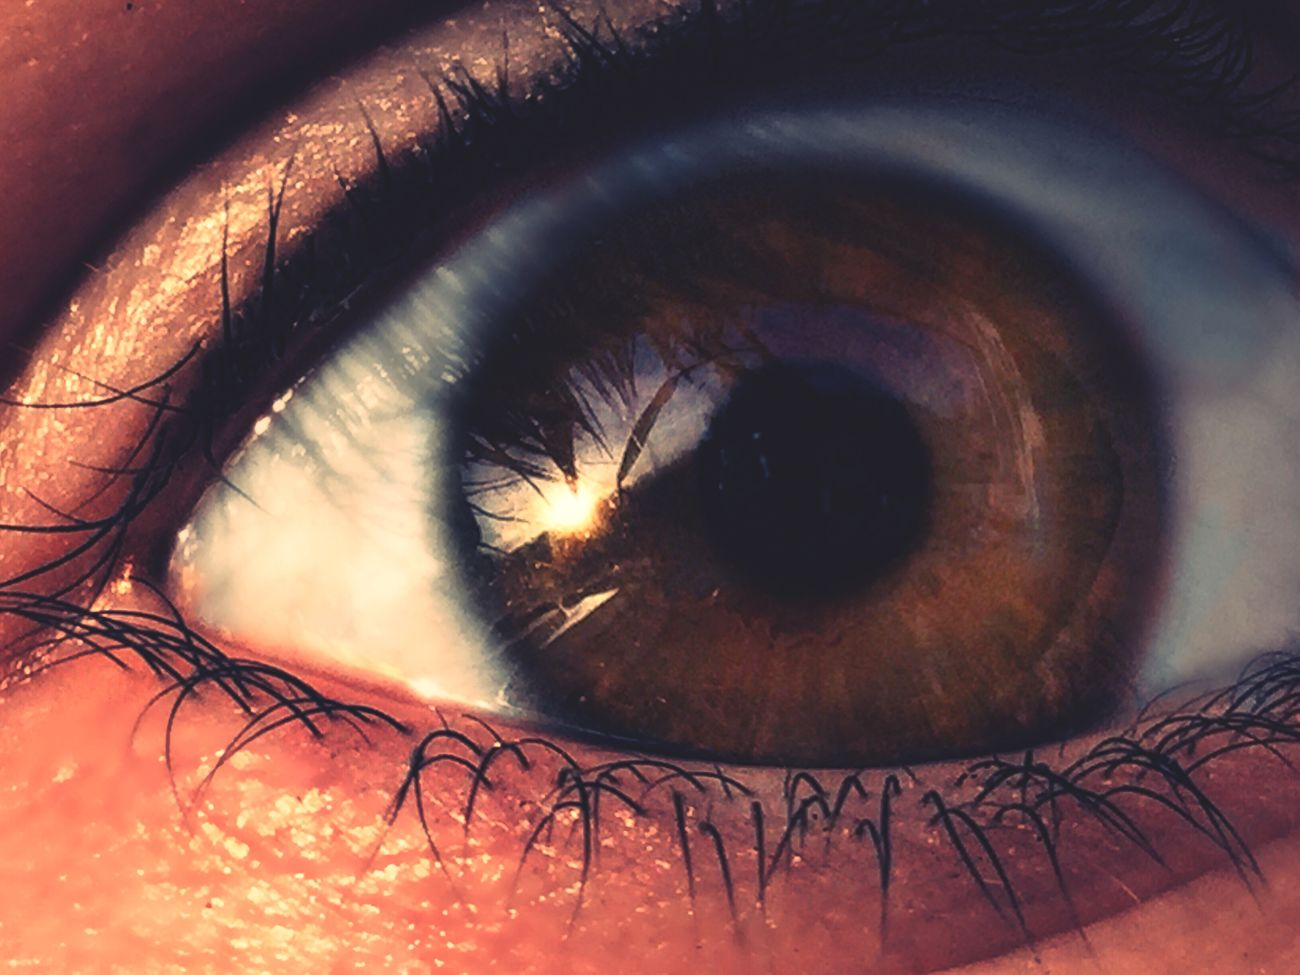 my eye for you 🌊 Human Eye Eyelash Eyesight Sensory Perception Real People Human Body Part Close-up Extreme Close-up Unrecognizable Person Iris - Eye One Person First Eyeem Photo